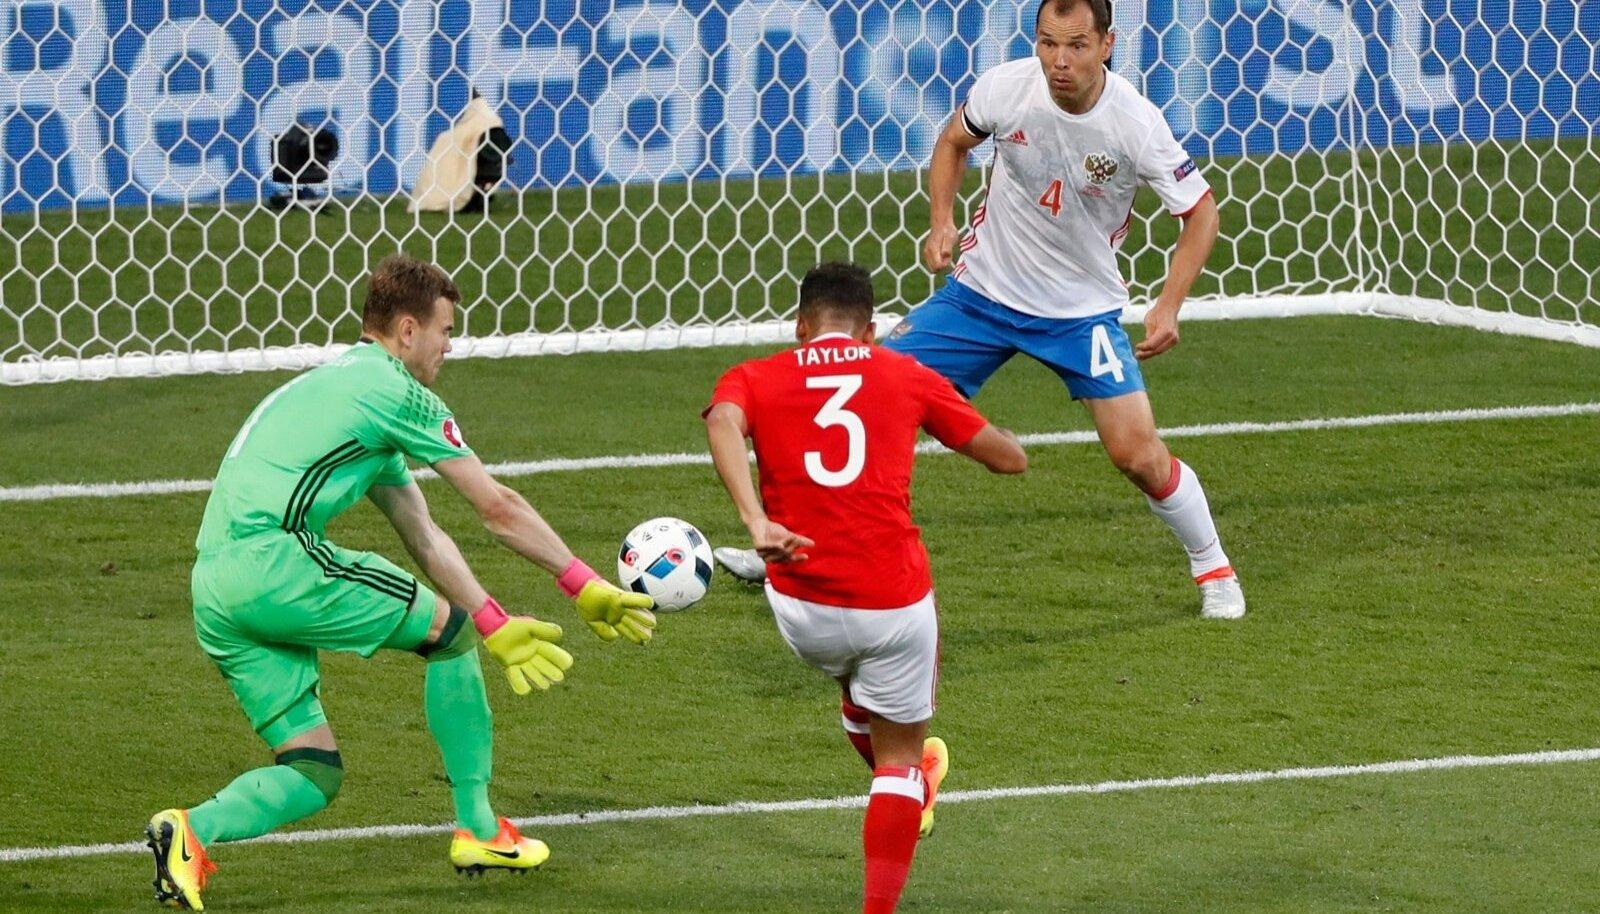 Venemaa vs Wales